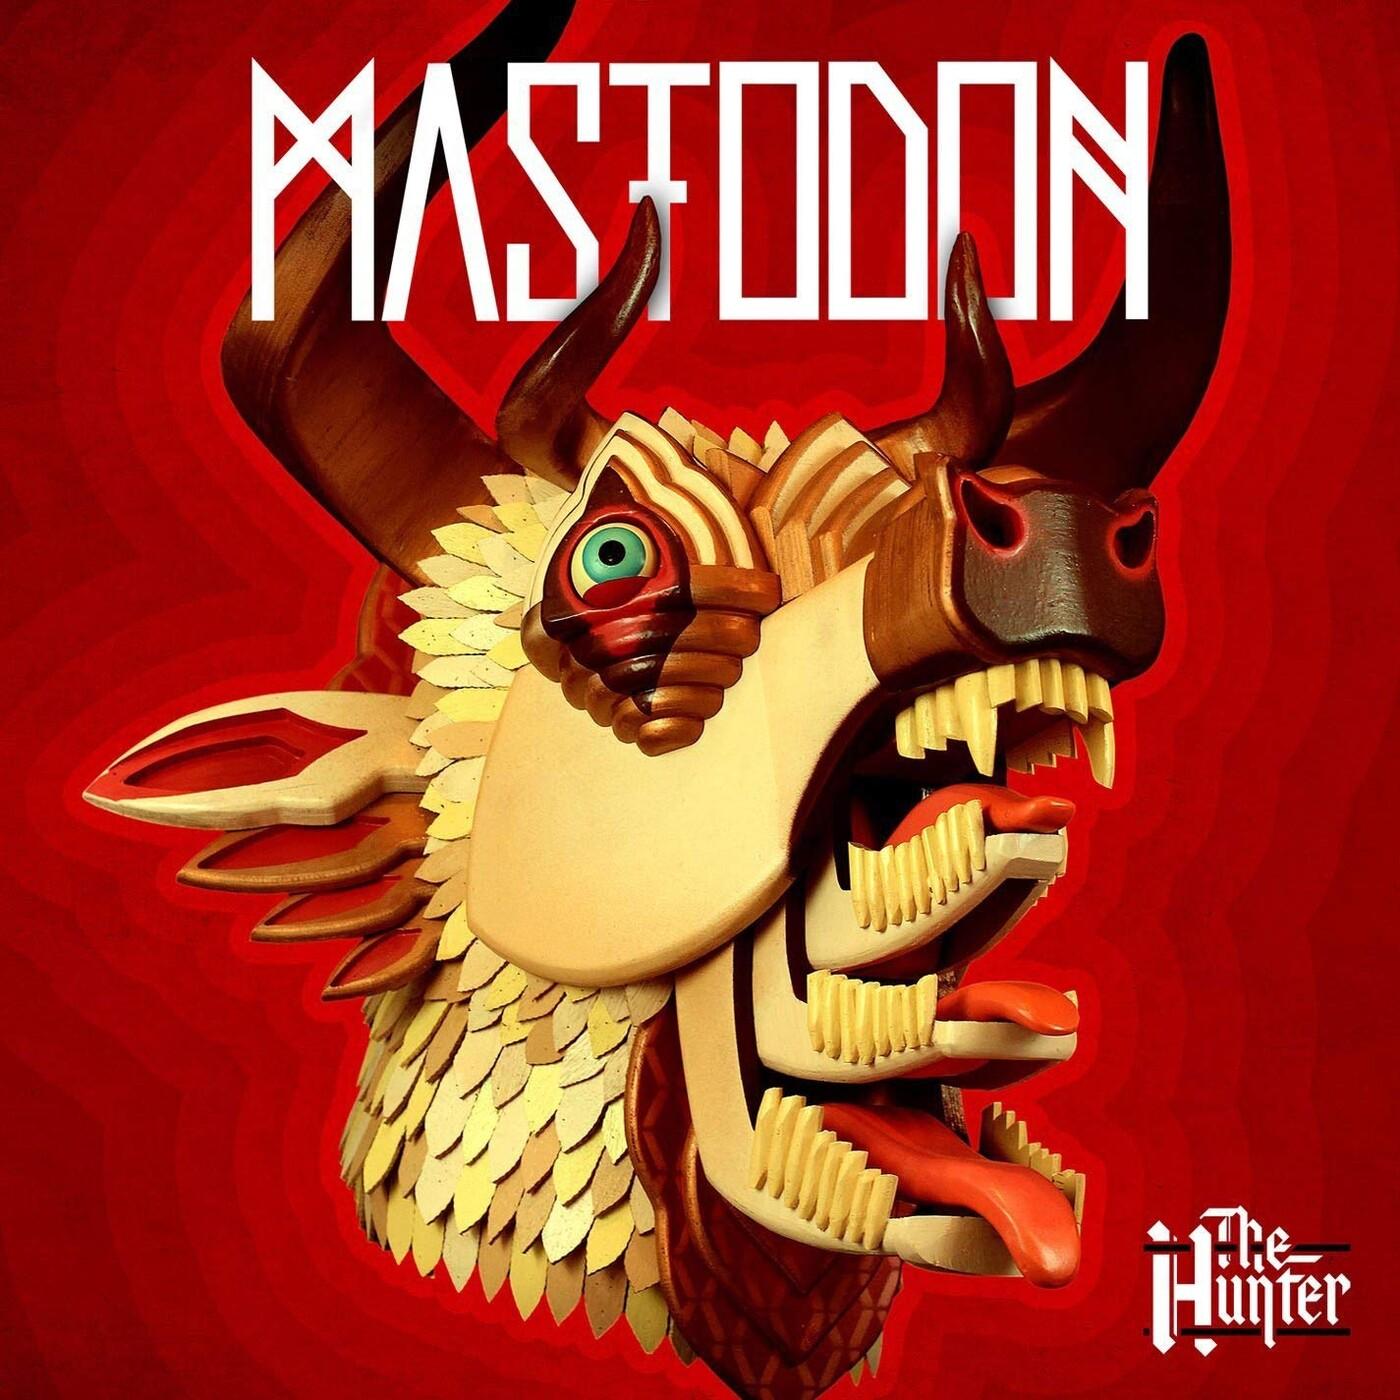 Mastodon, Neil Young, John Mayer, Metallica, Liza Colby Sound en La Gran Travesía.